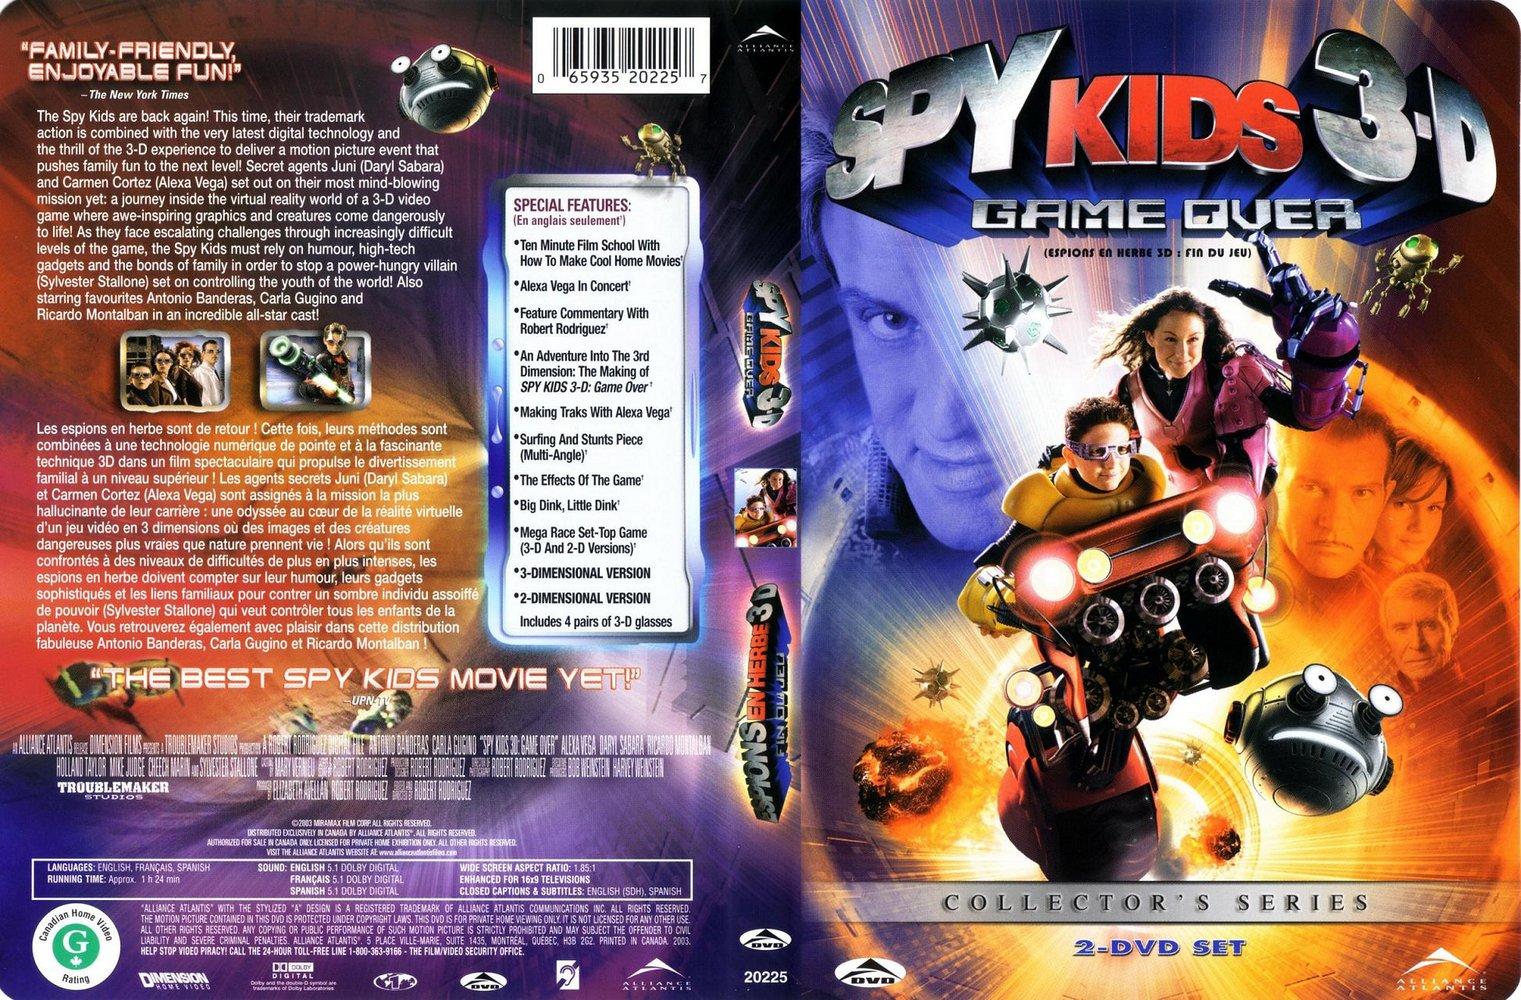 mi colection dvd: 3D